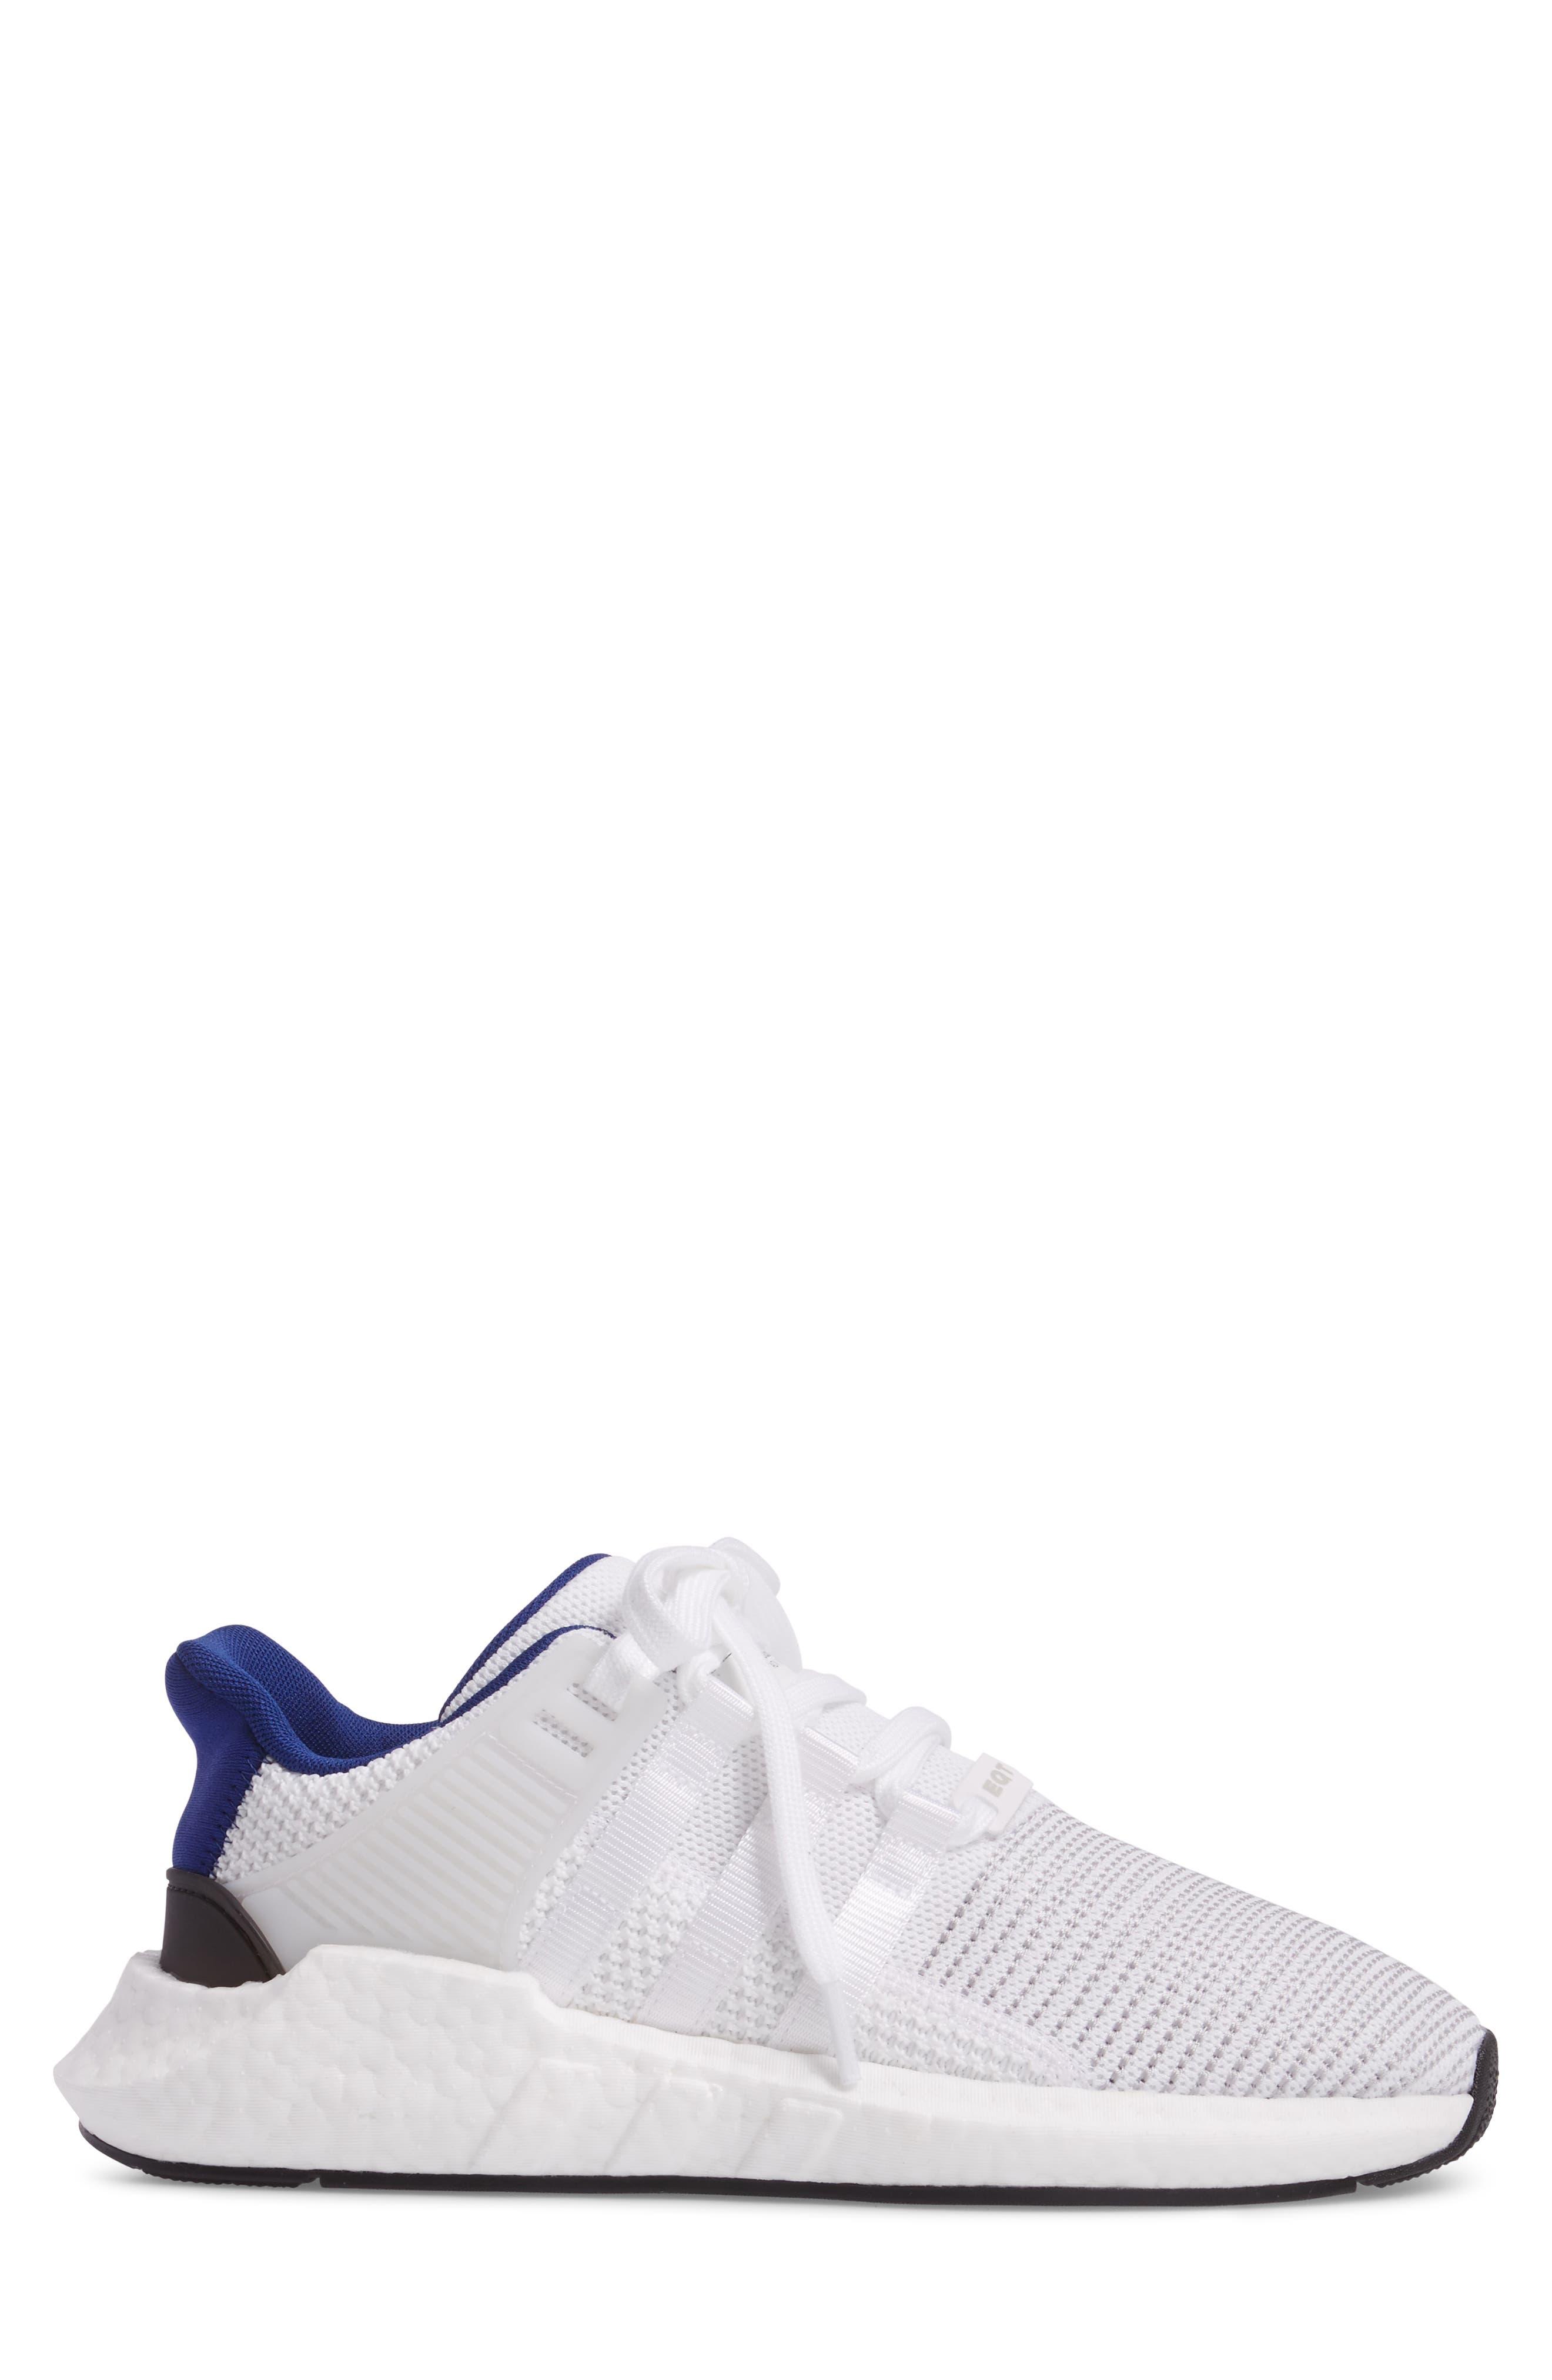 EQT Support 93/17 Sneaker,                             Alternate thumbnail 3, color,                             White/ White/ Core Black